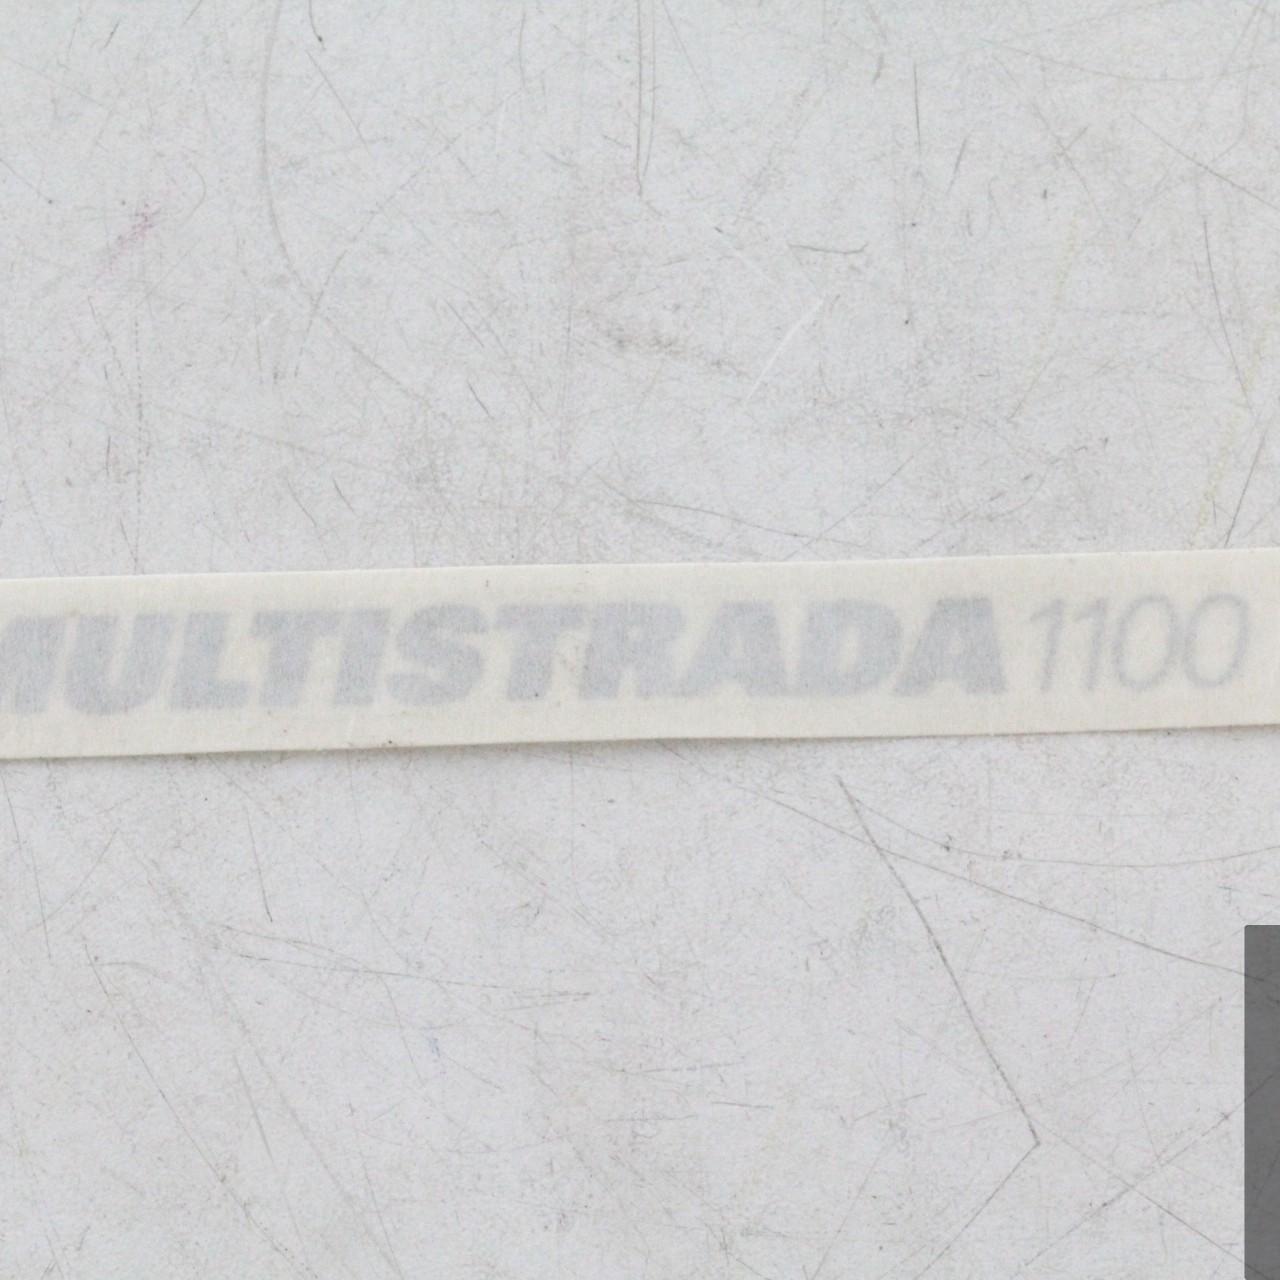 Adesivo decal ducati multistrada 1100